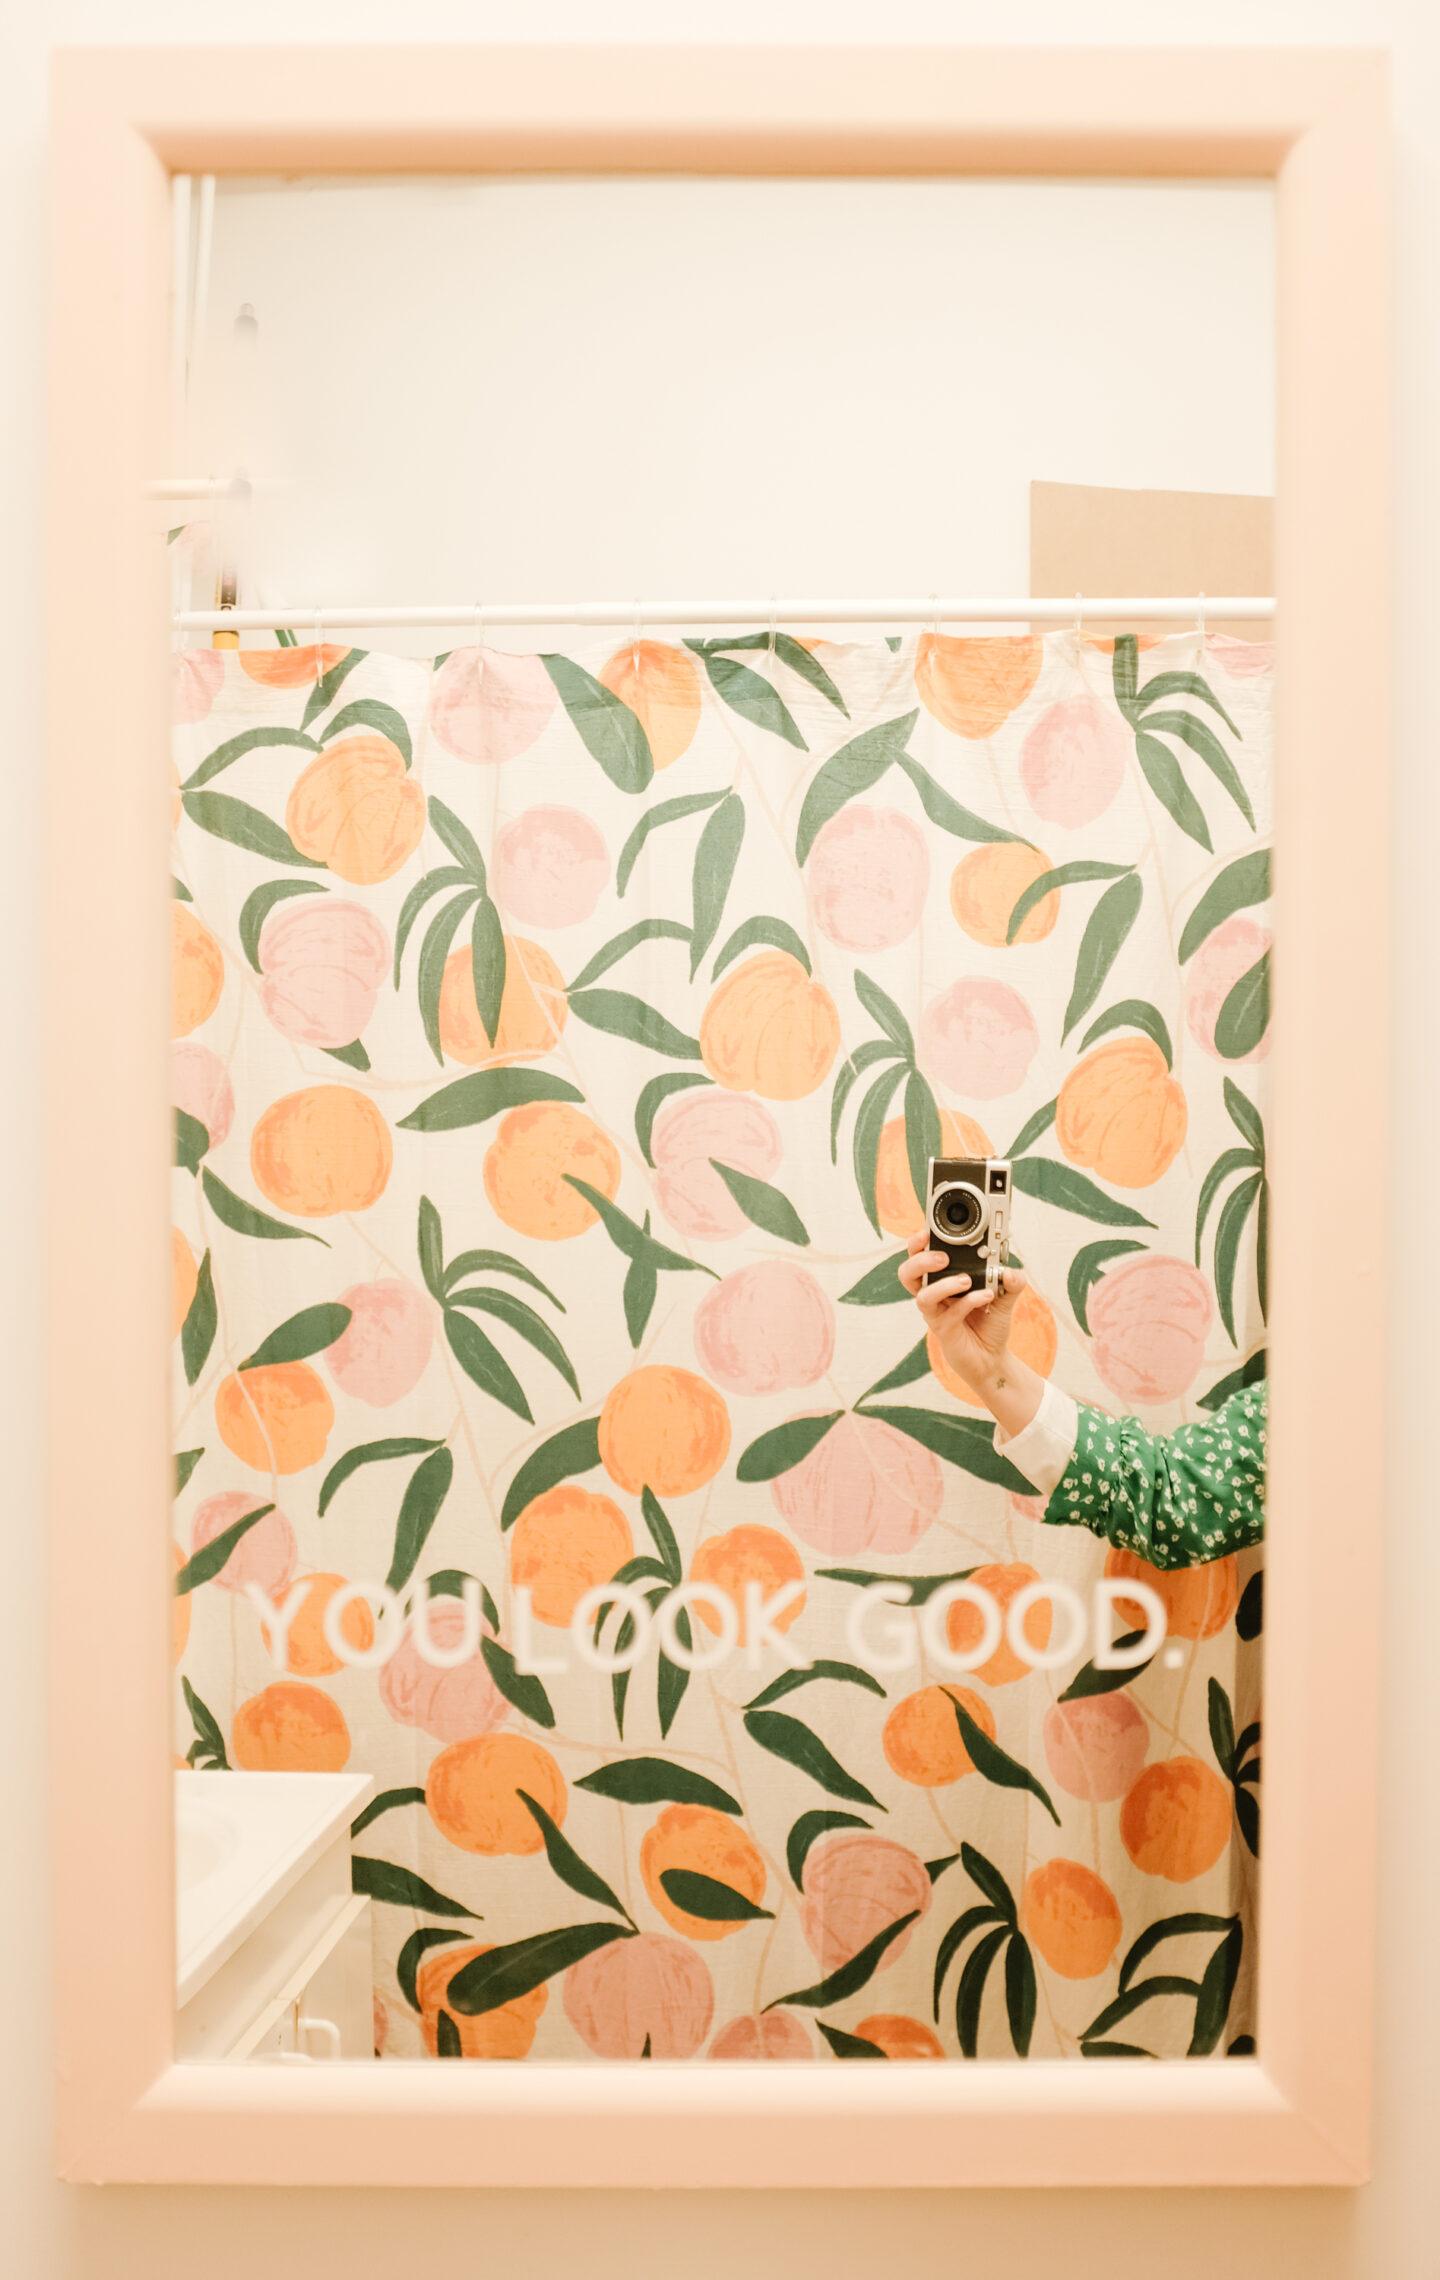 you look good mirror in a bathroom